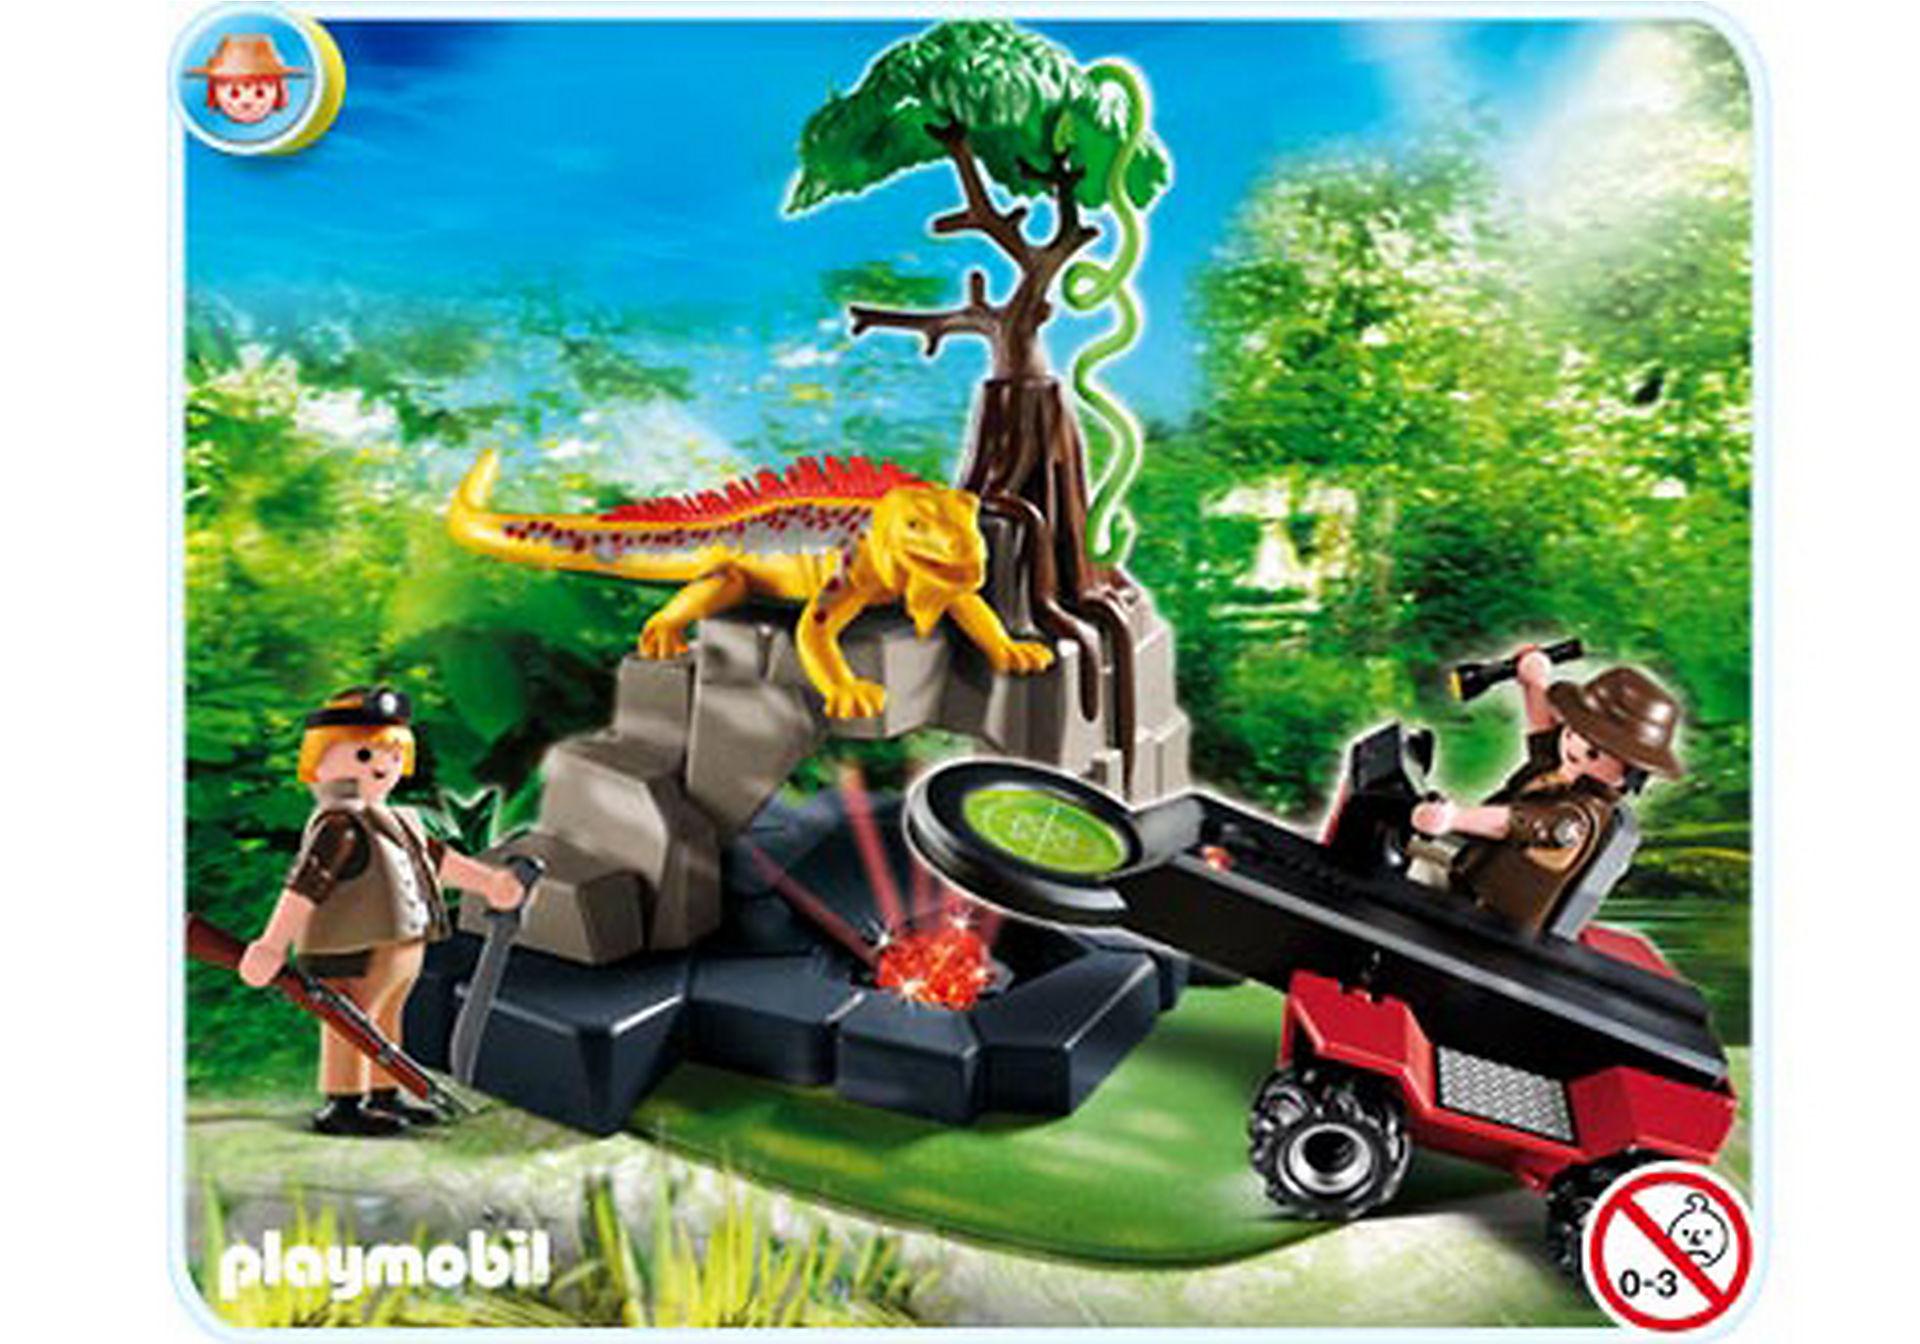 http://media.playmobil.com/i/playmobil/4847-A_product_detail/Schatzsucher mit Metalldetektor